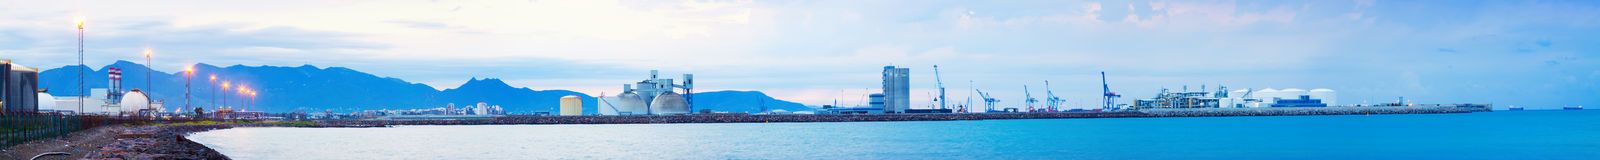 Panarama of Puerto de Castellon -  industrial port Stock Images